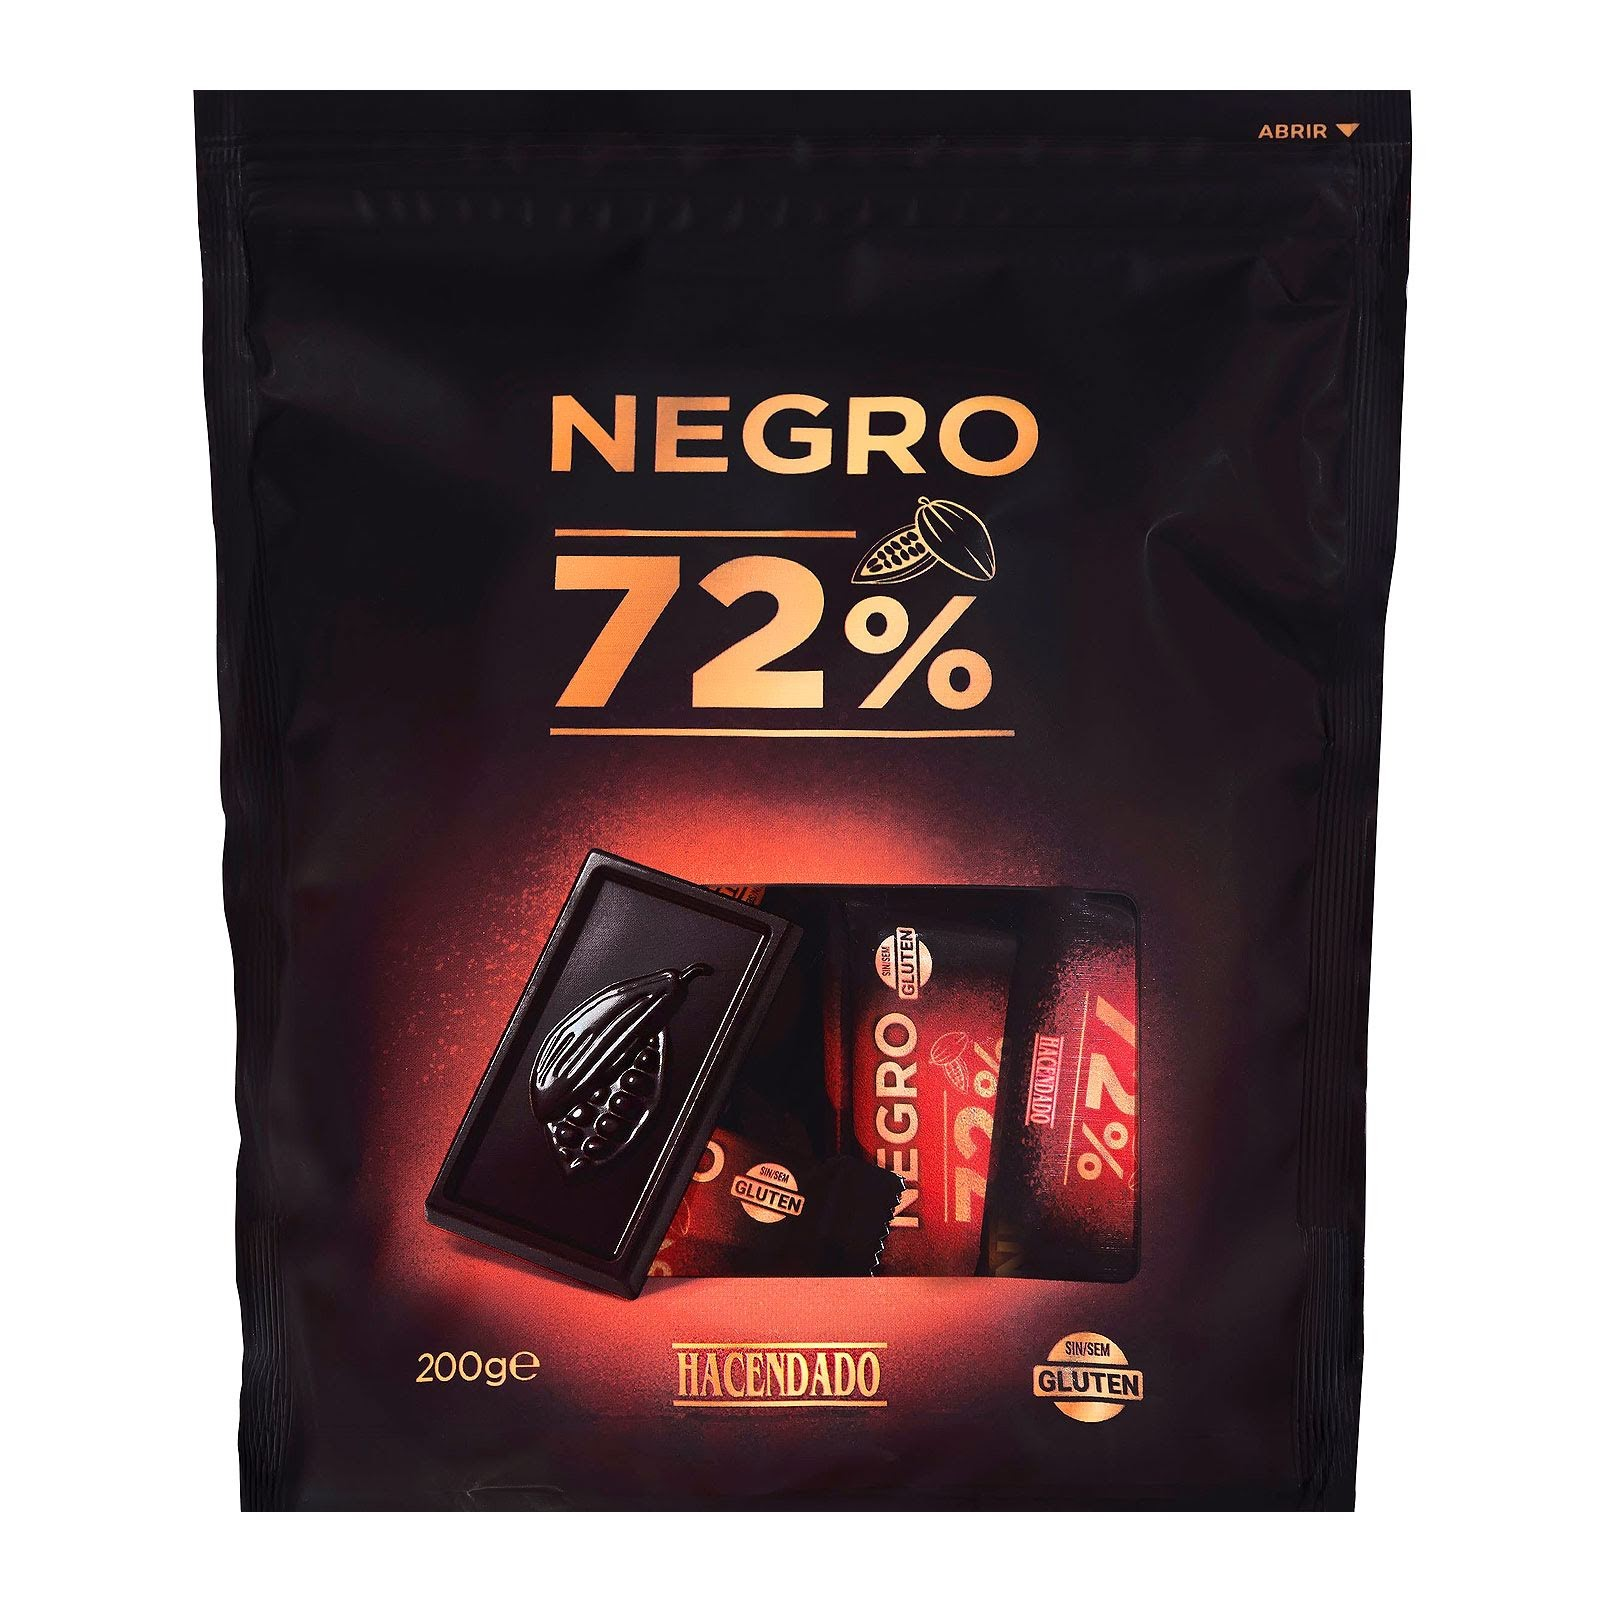 Chocolatinas de chocolate negro extrafino 72% de cacao Hacendado